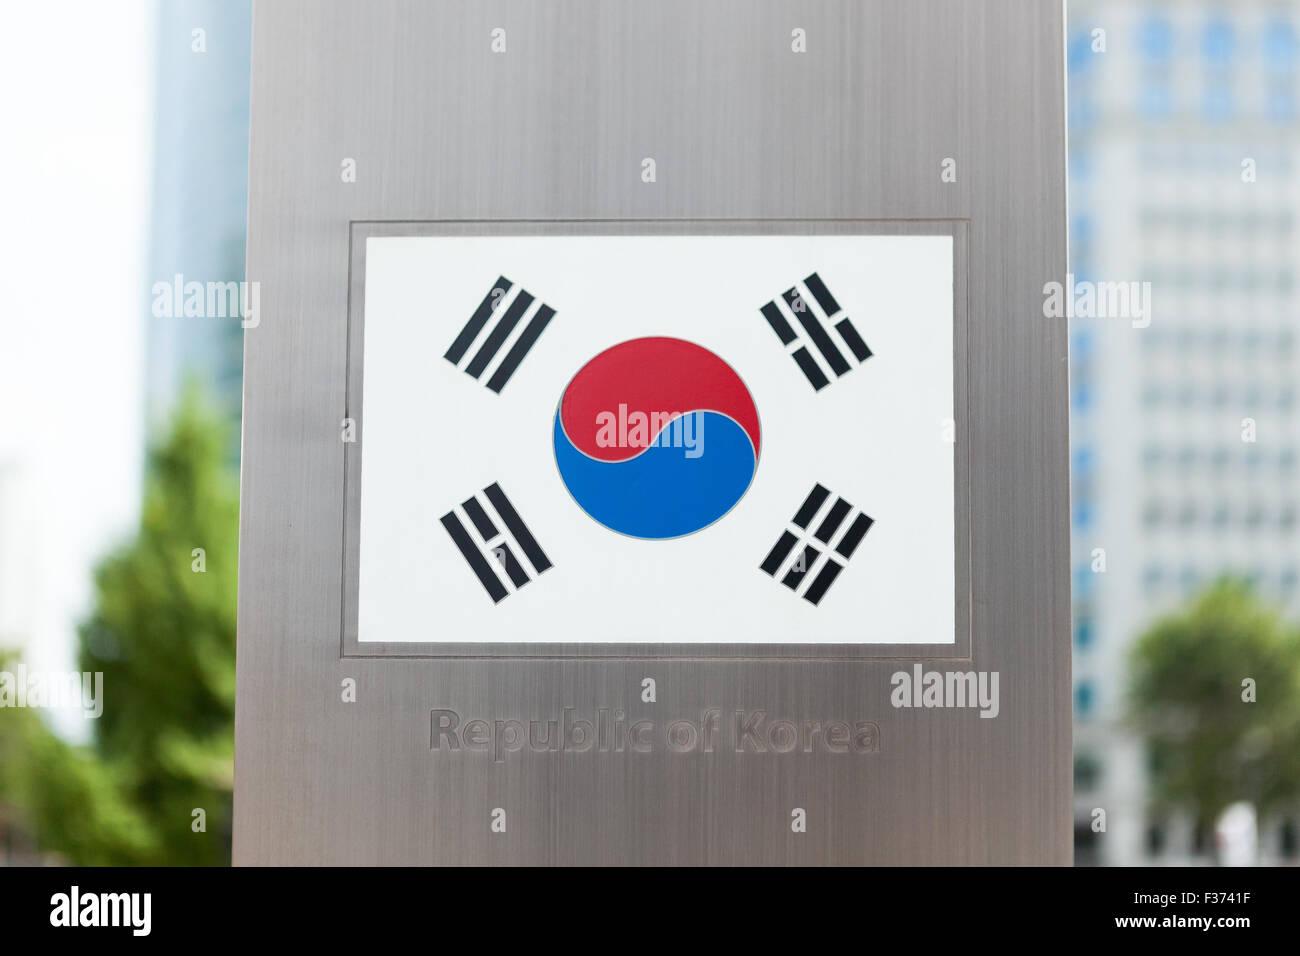 National flags on pole series - Republic of Korea Stock Photo